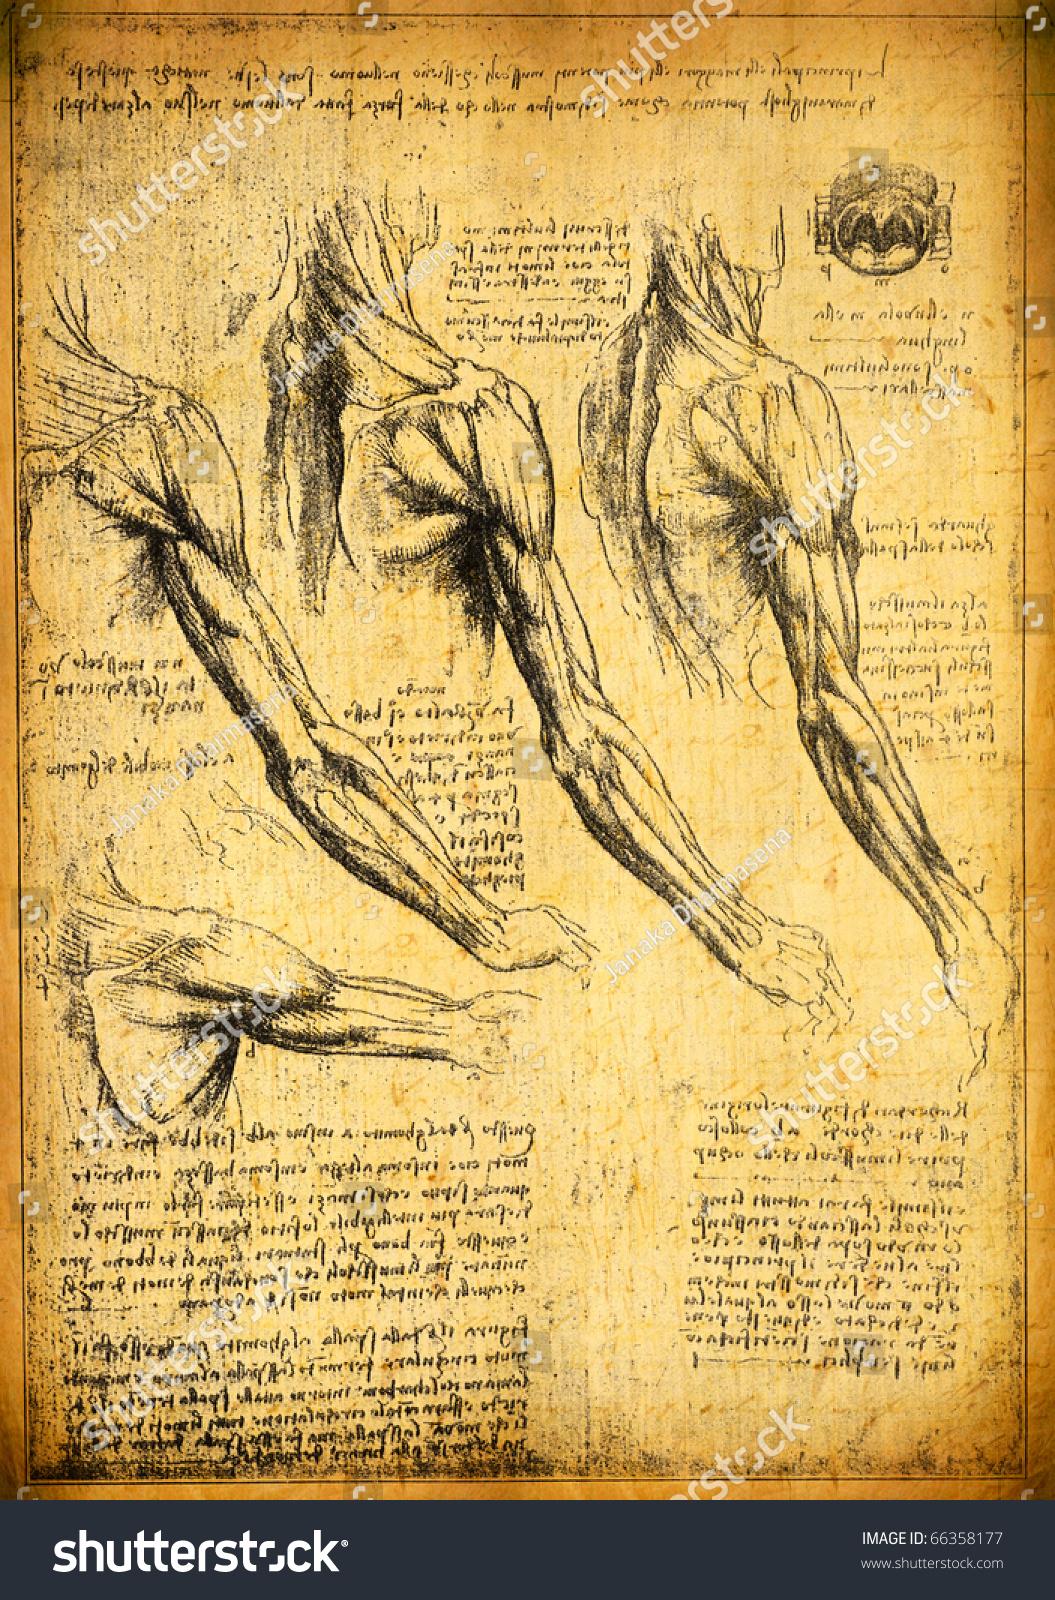 Anatomy Art By Leonardo Da Vinci Stock Illustration ...